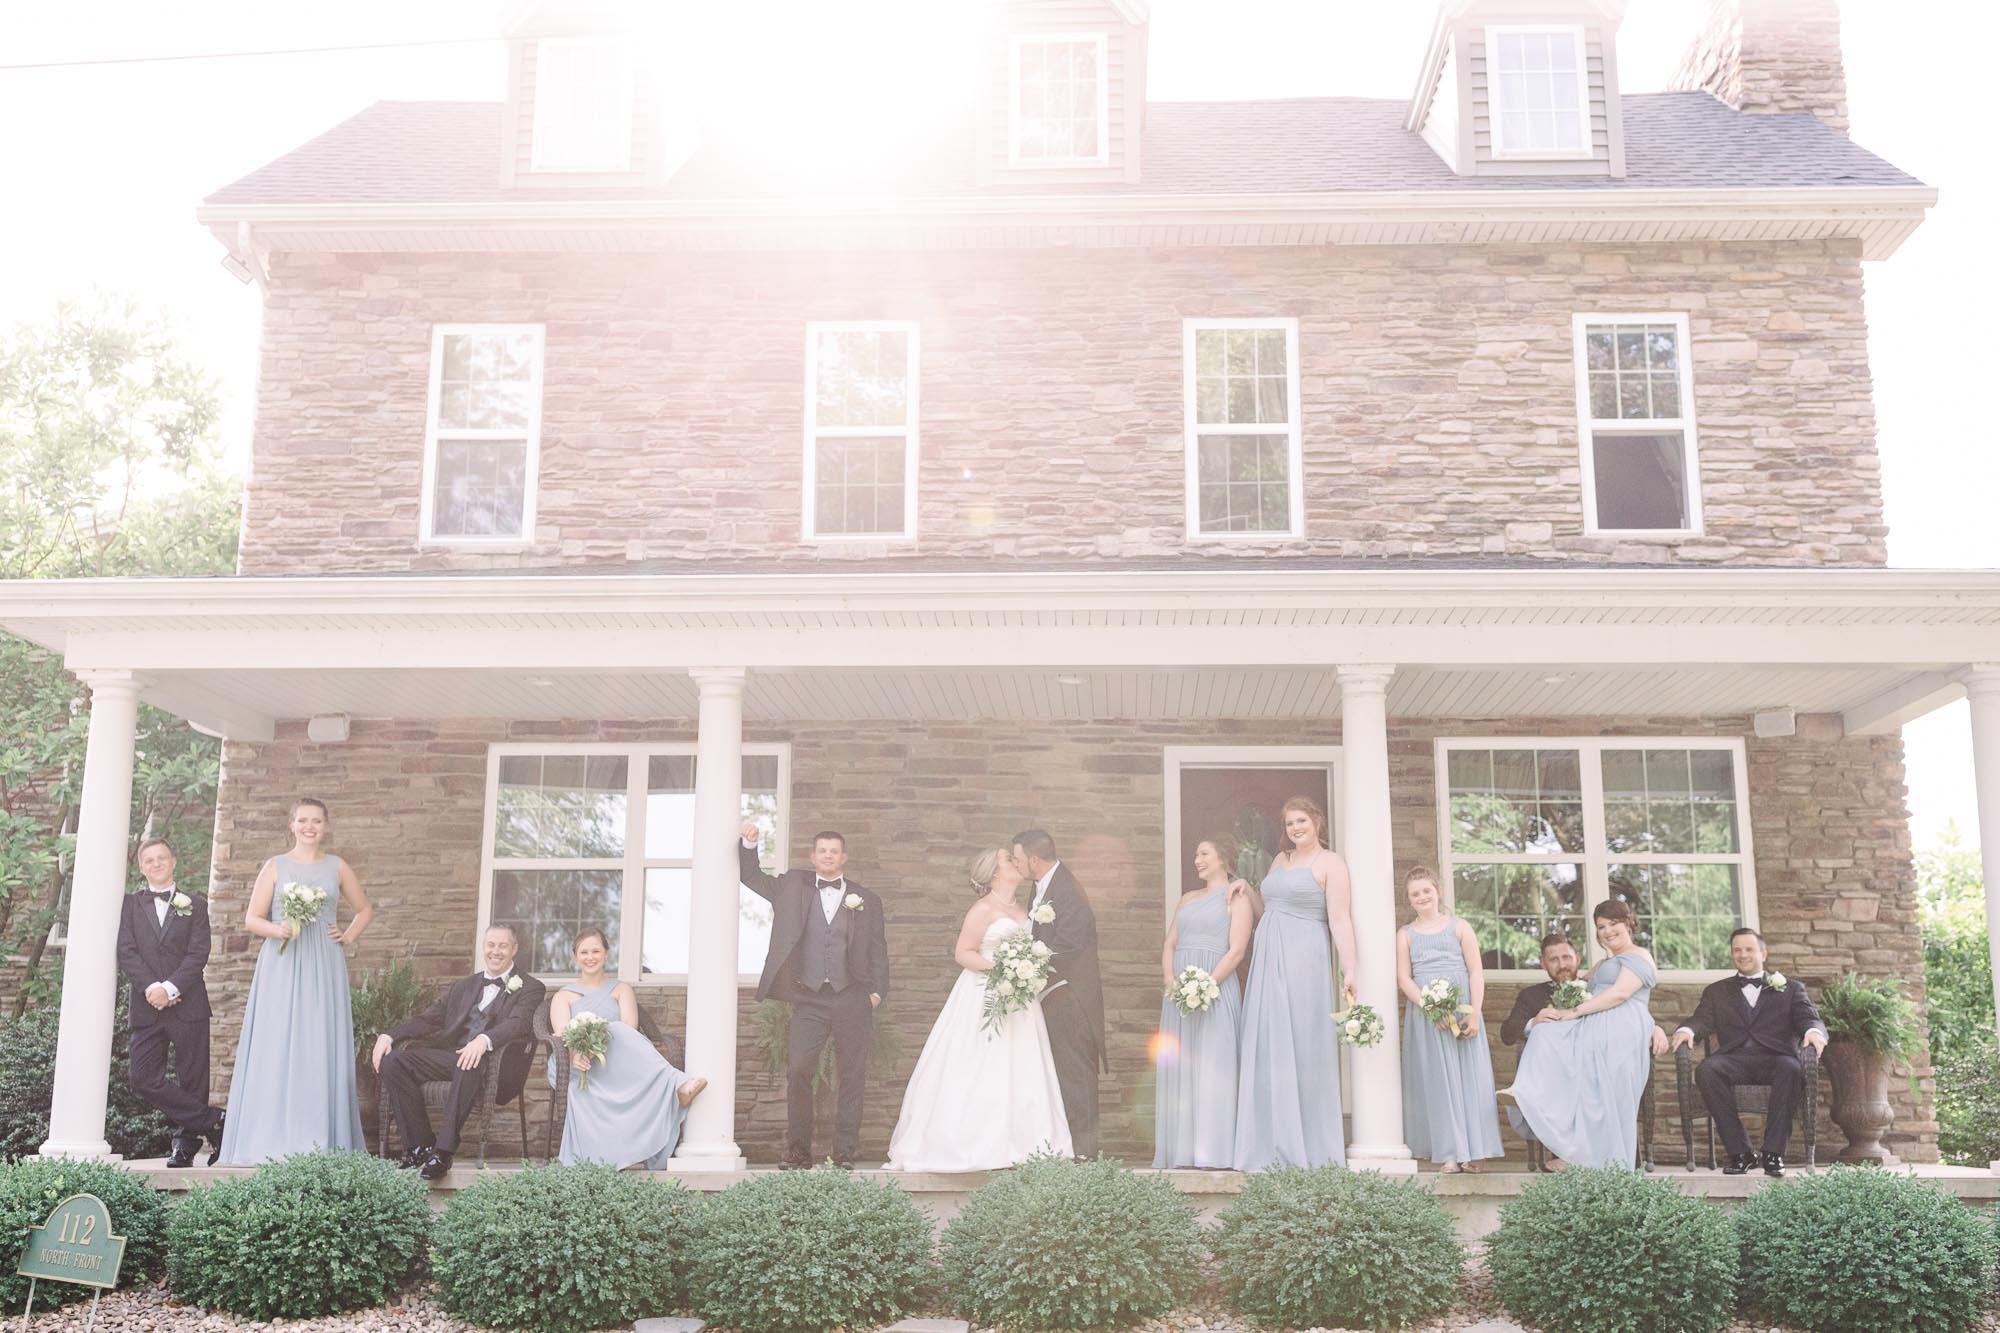 isle-of-que-wedding-6827.jpg